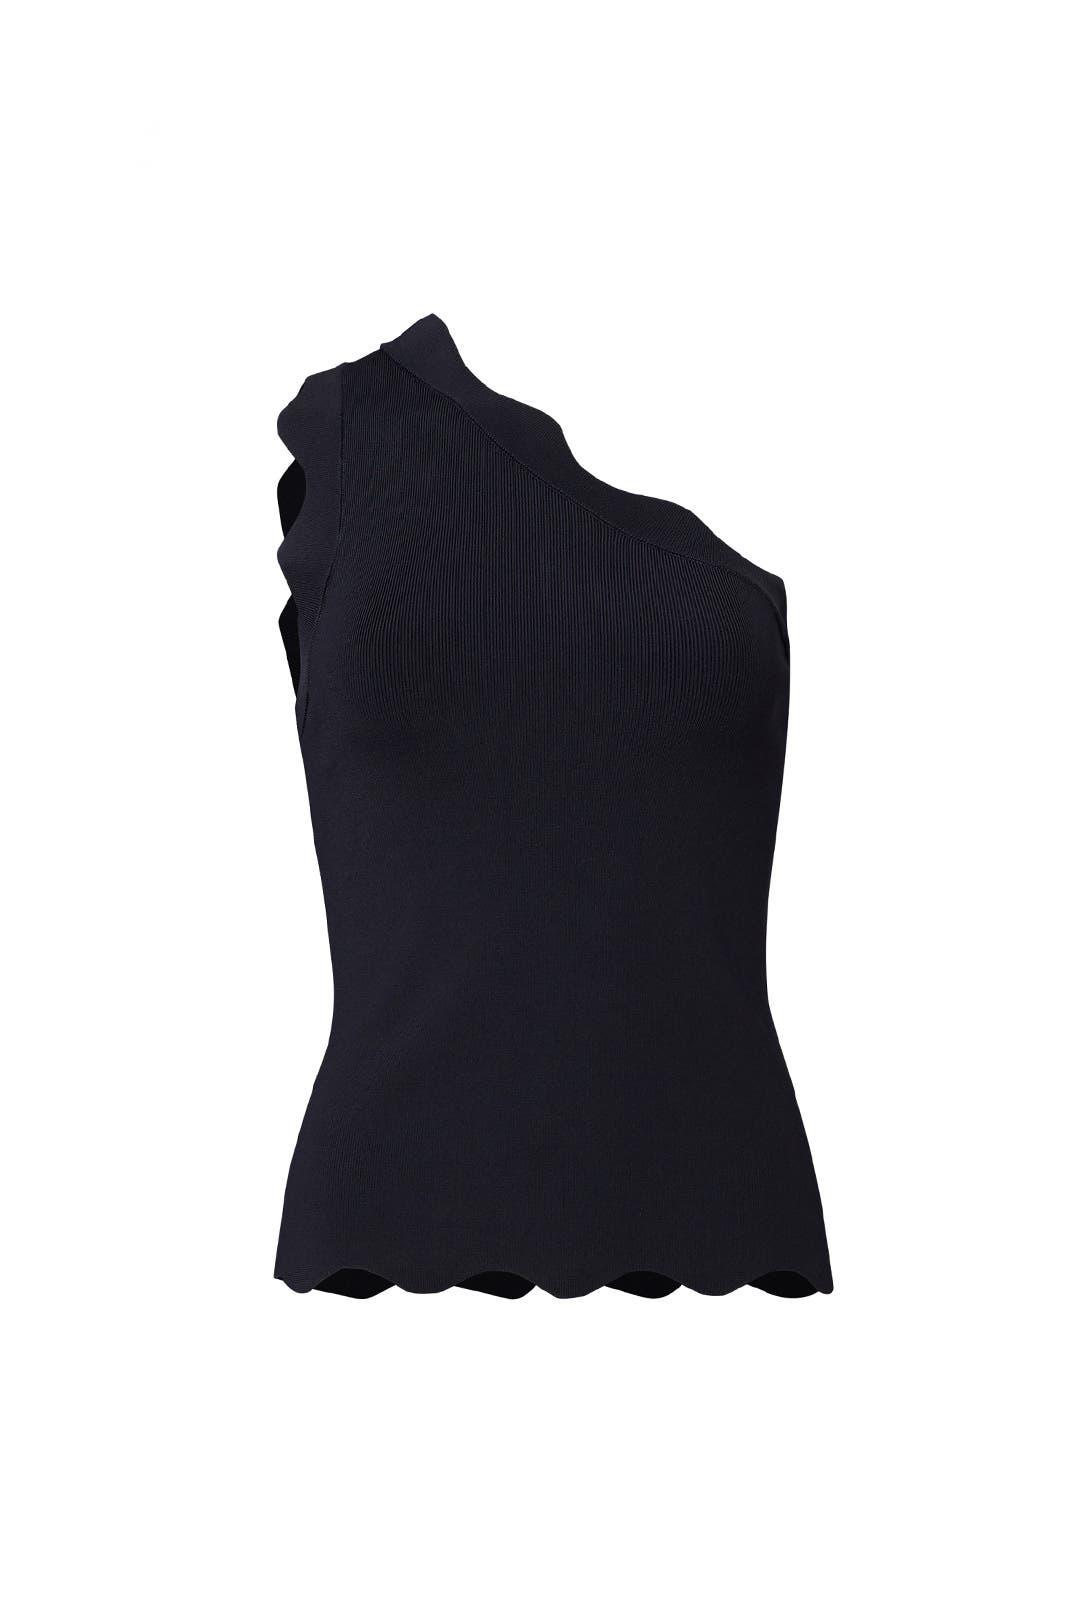 56627fd268c89 Bailey 44. Read Reviews. Jasmine Sweater Top